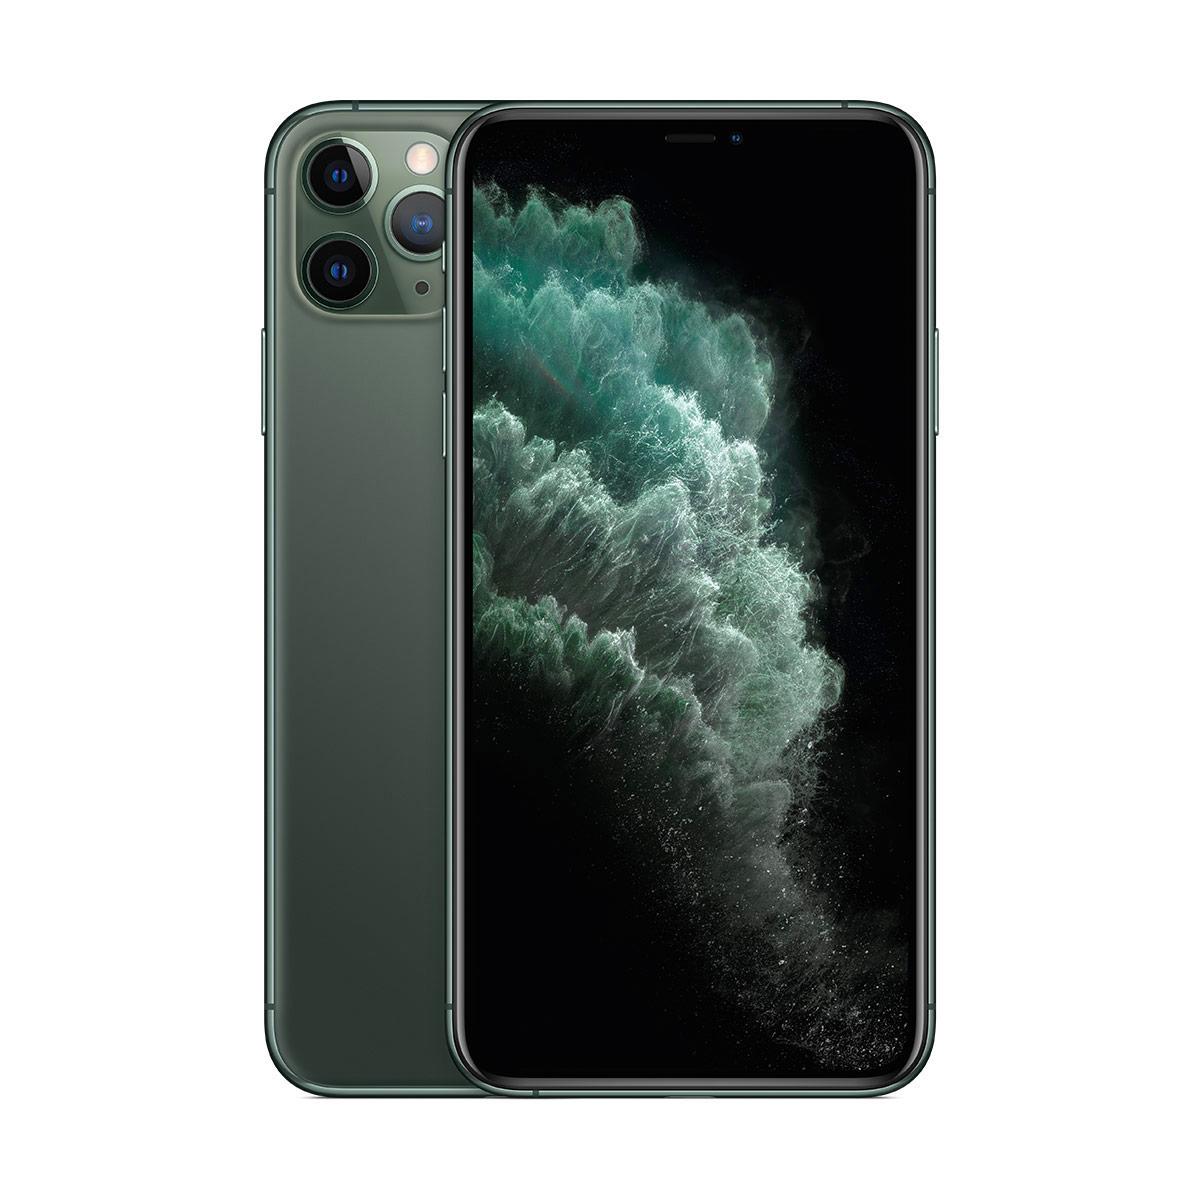 Apple iPhone 11 Pro 64GB Midnight Green - Unlocked